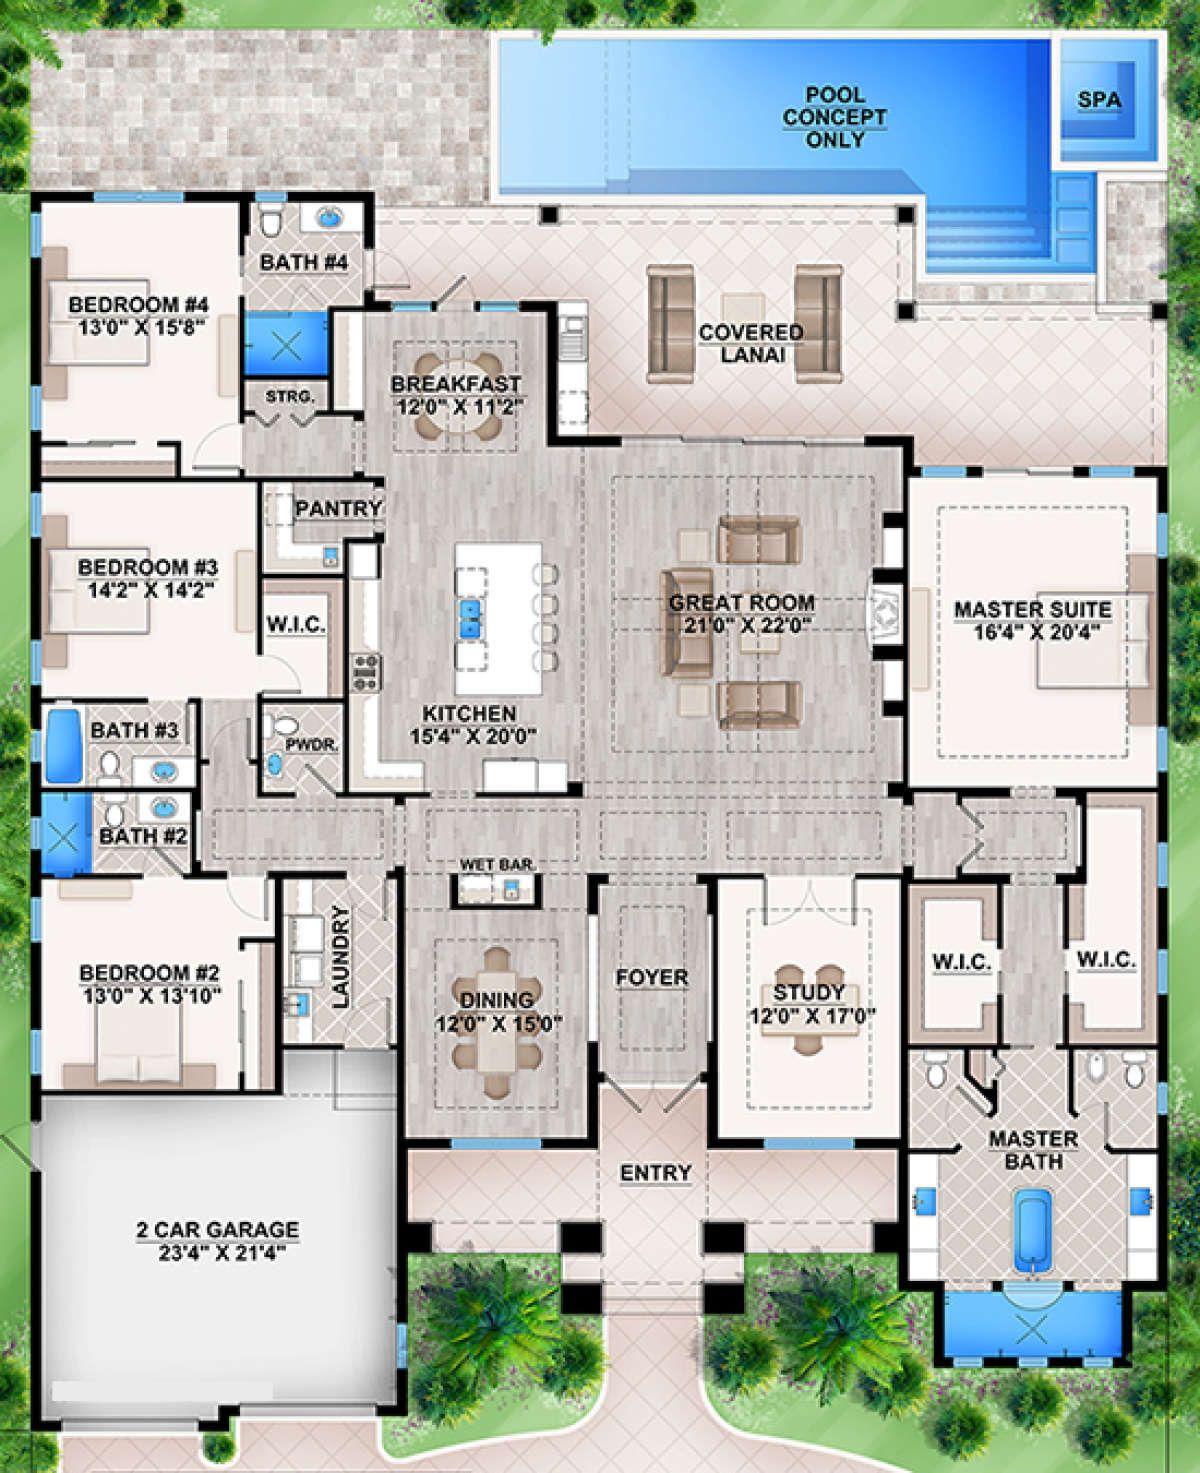 House Plan 5565-00017 - Luxury Plan: 3,996 Square Feet, 4 Bedrooms, 4.5 Bathrooms